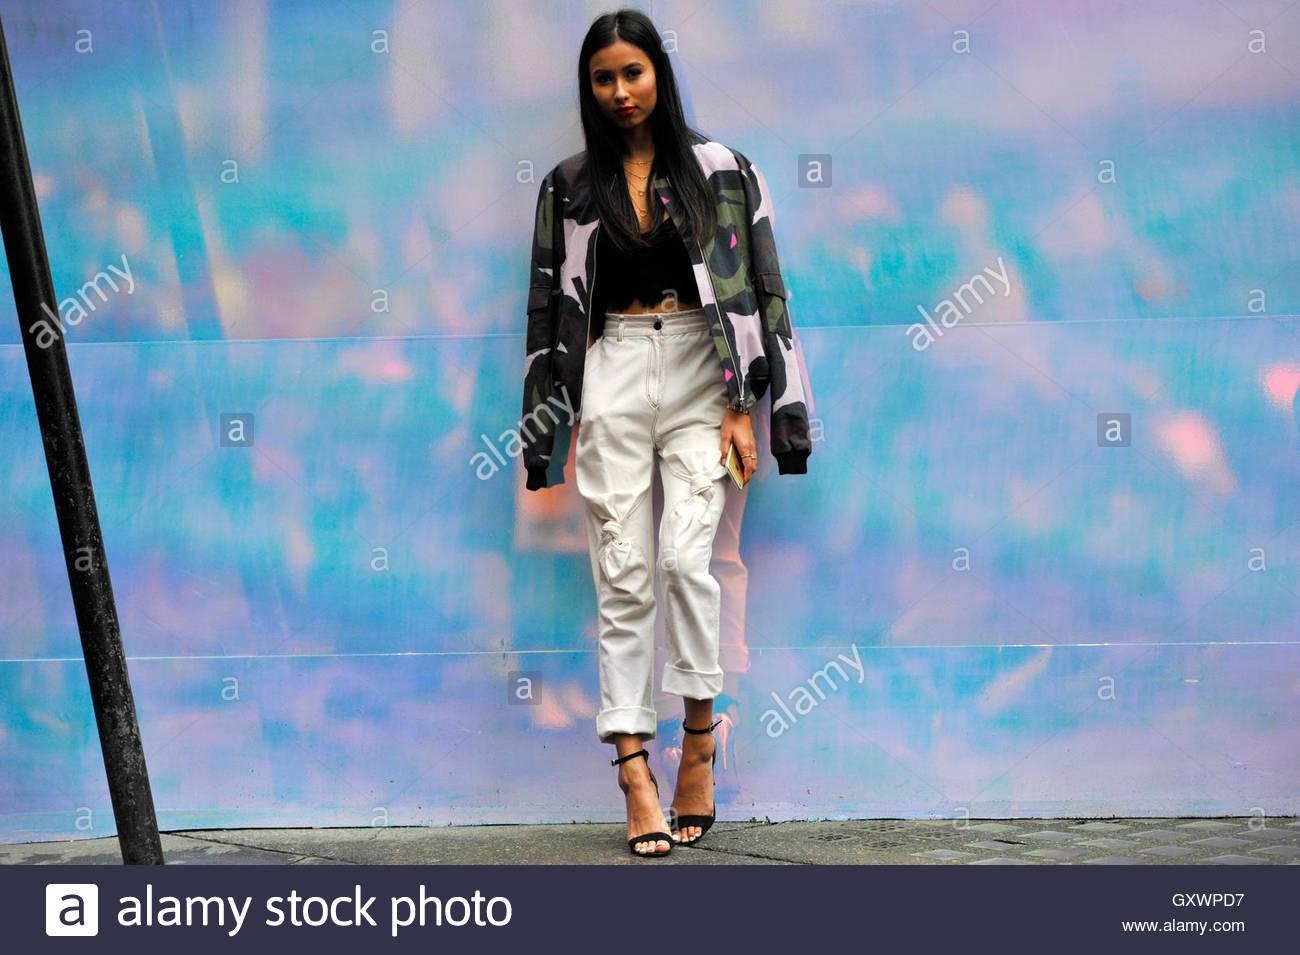 UK Big Brother Celebrity Evelyn Ellis in der Brewer Street während der London Fashion Week SS17 FW16 Street Stockbild